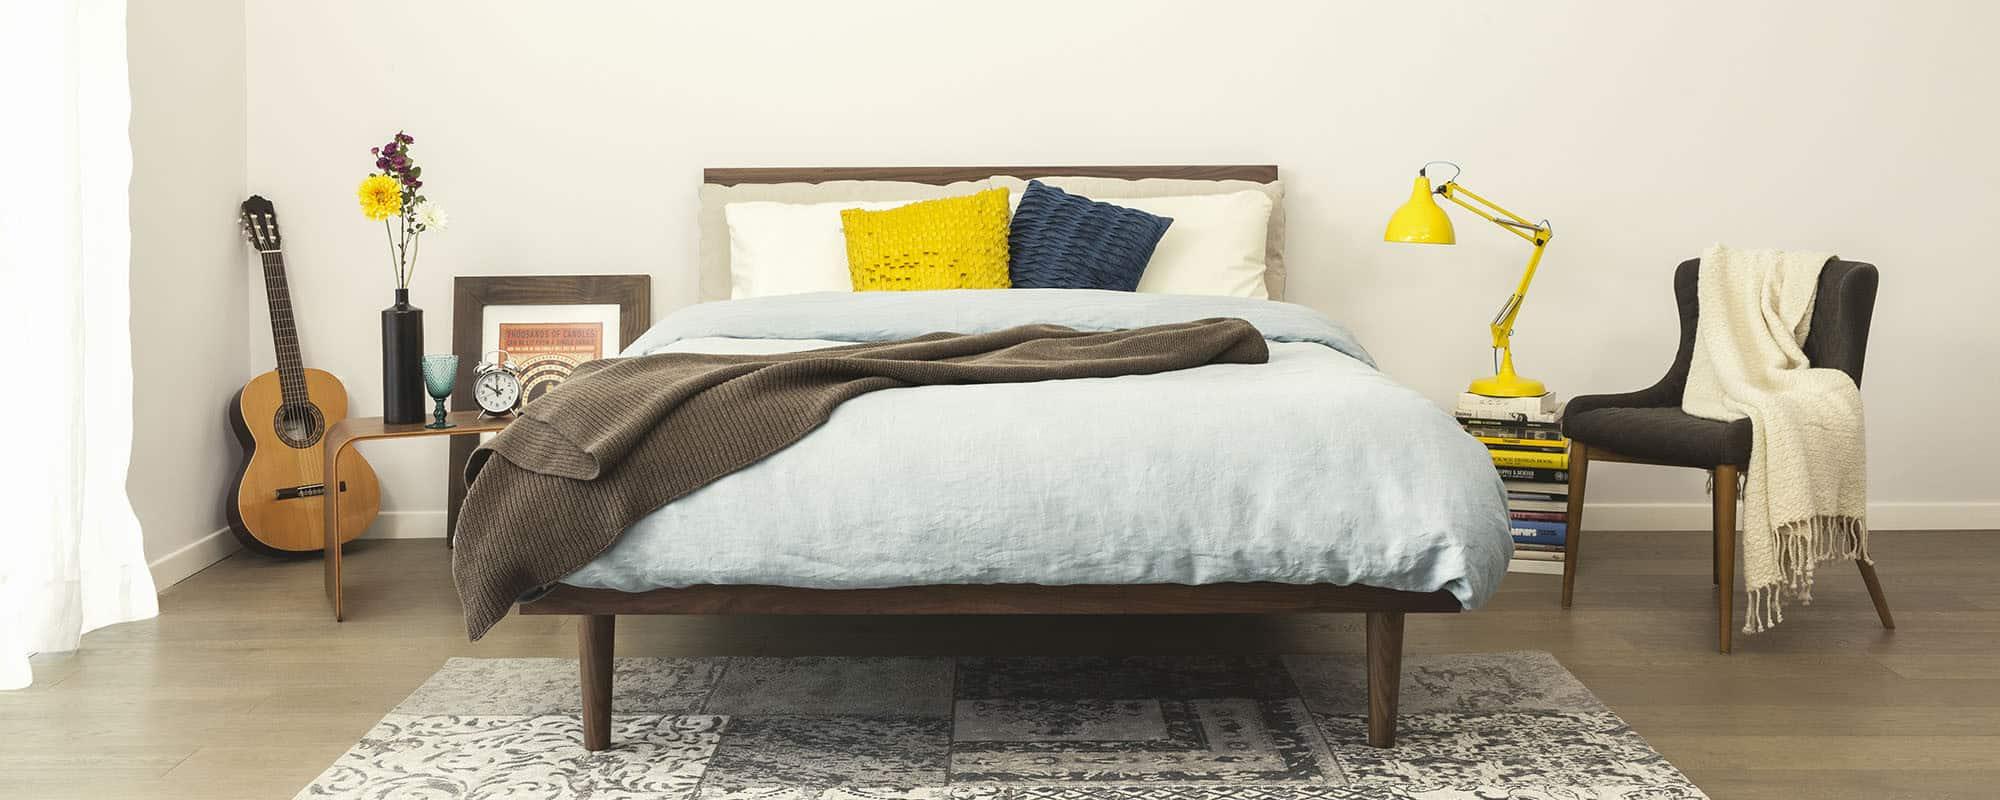 nolah-mattress